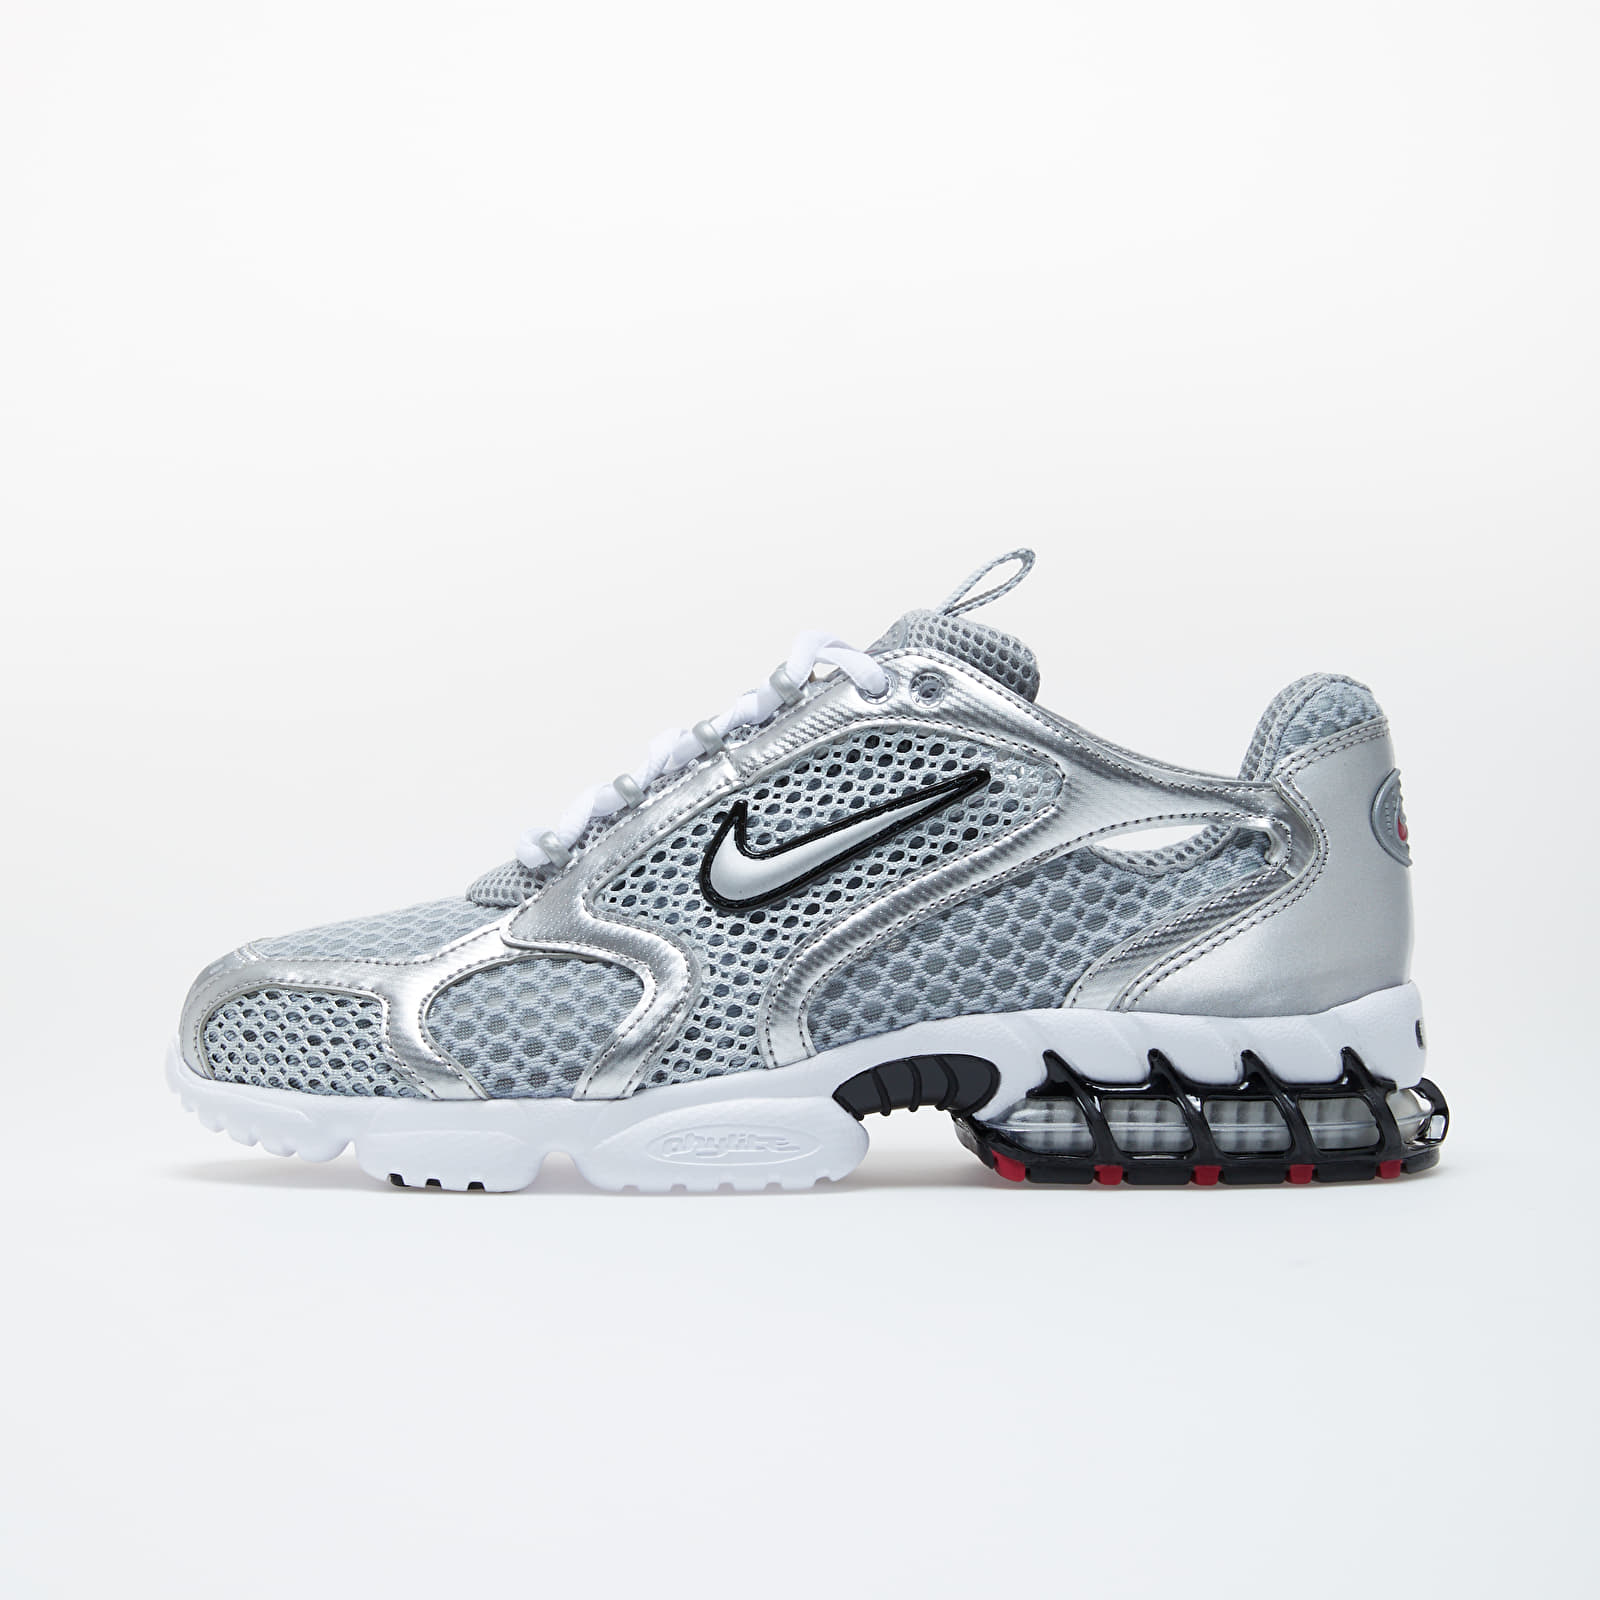 Pánské tenisky a boty Nike Air Zoom Spiridon Cage 2 Lt Smoke Grey/ Metallic Silver